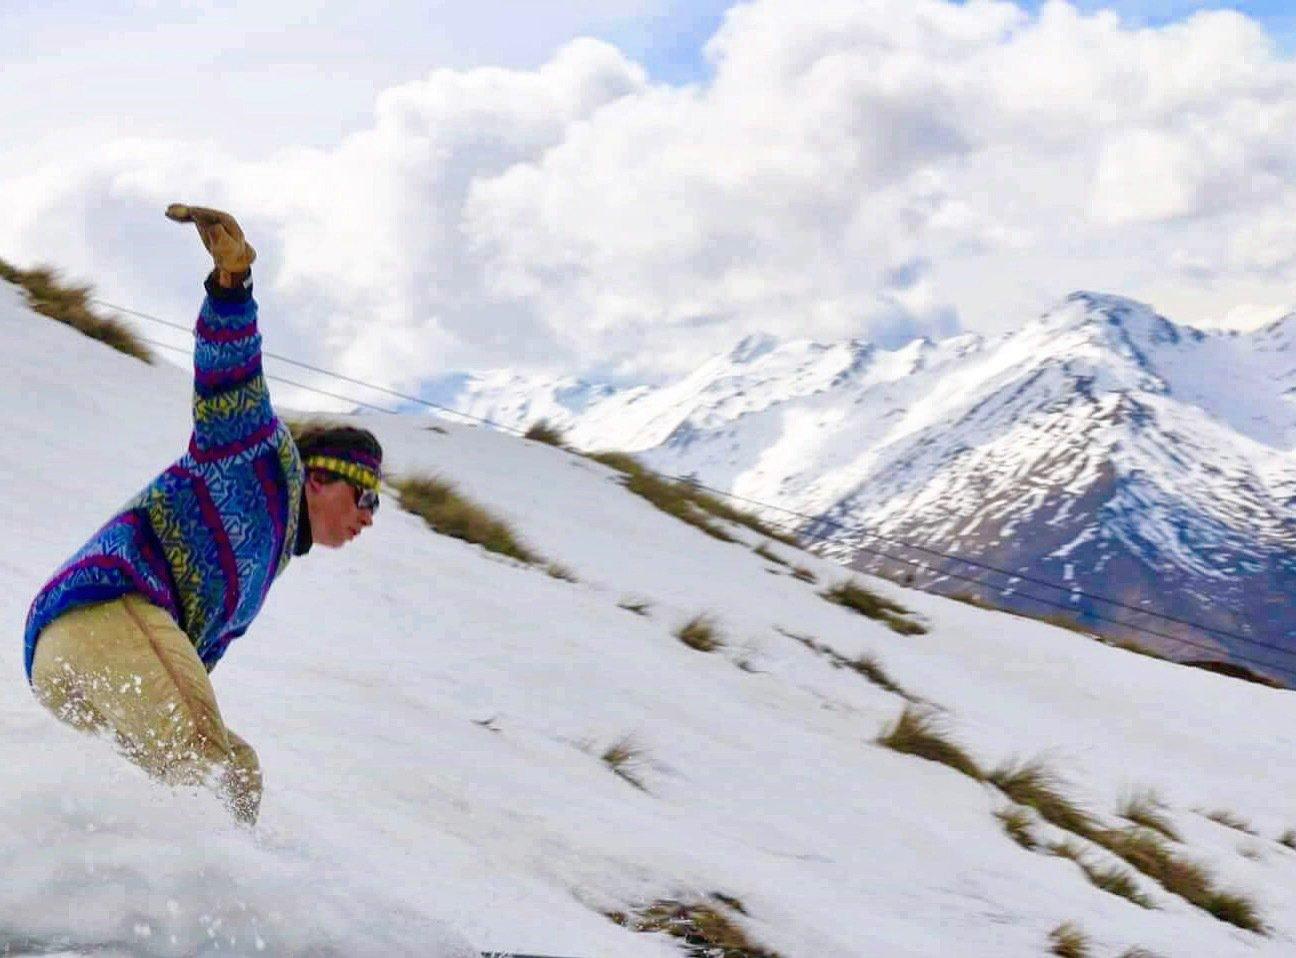 Retro straight ski swervin